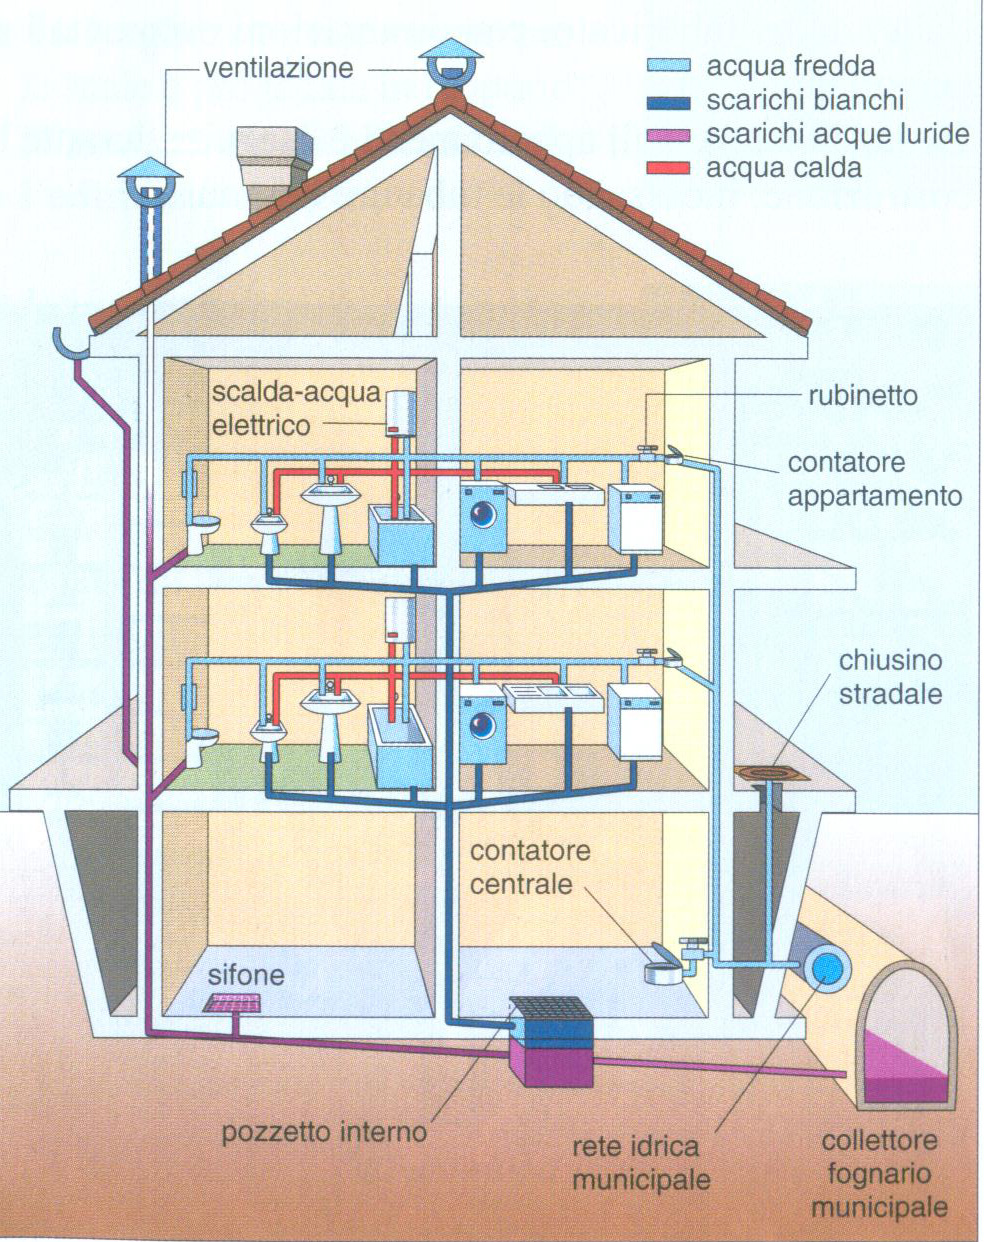 01 impianto idraulico sanitari - Acqua calda per andare in bagno ...